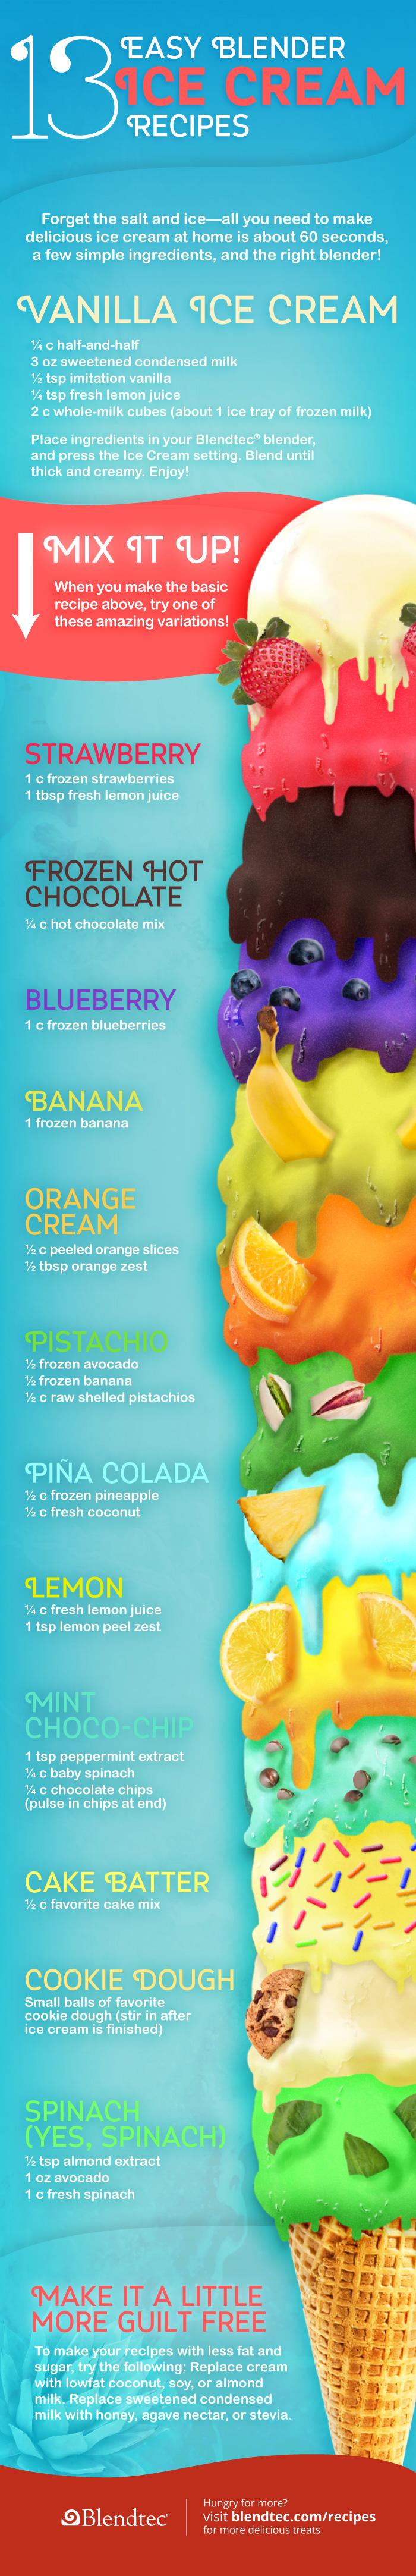 13 Blender Ice Cream Recipes